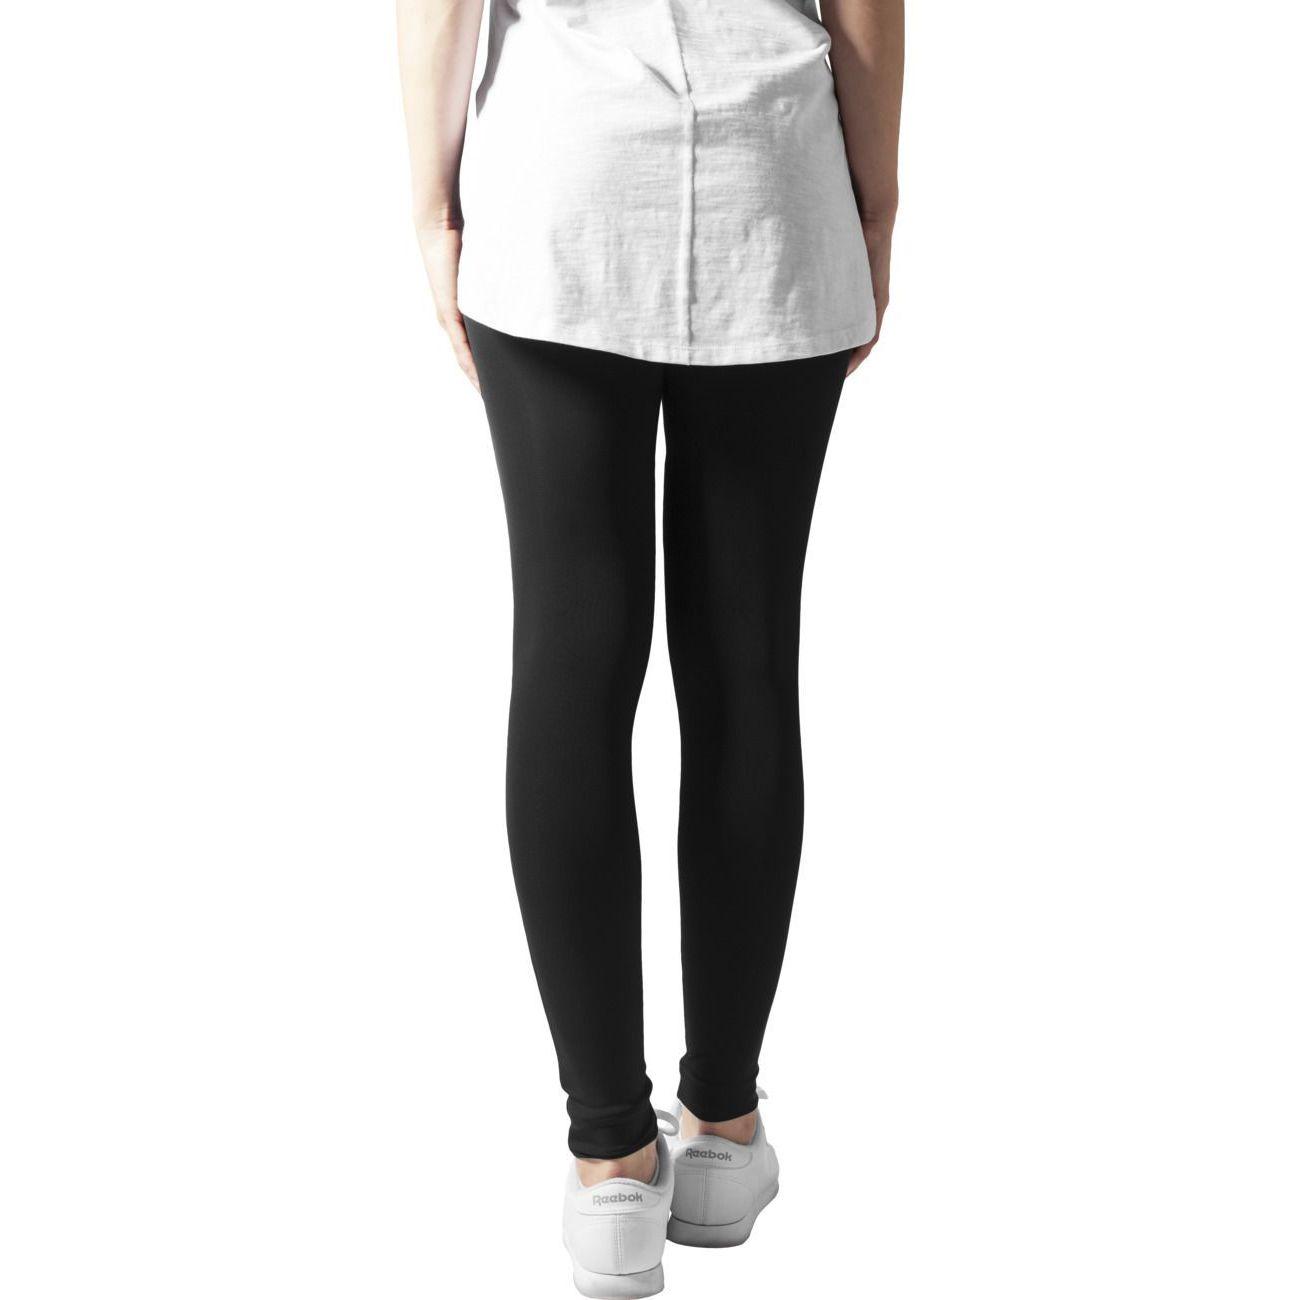 Mode- Lifestyle femme URBAN CLASSICS Legging Tech Mesh Urban Classics Noir